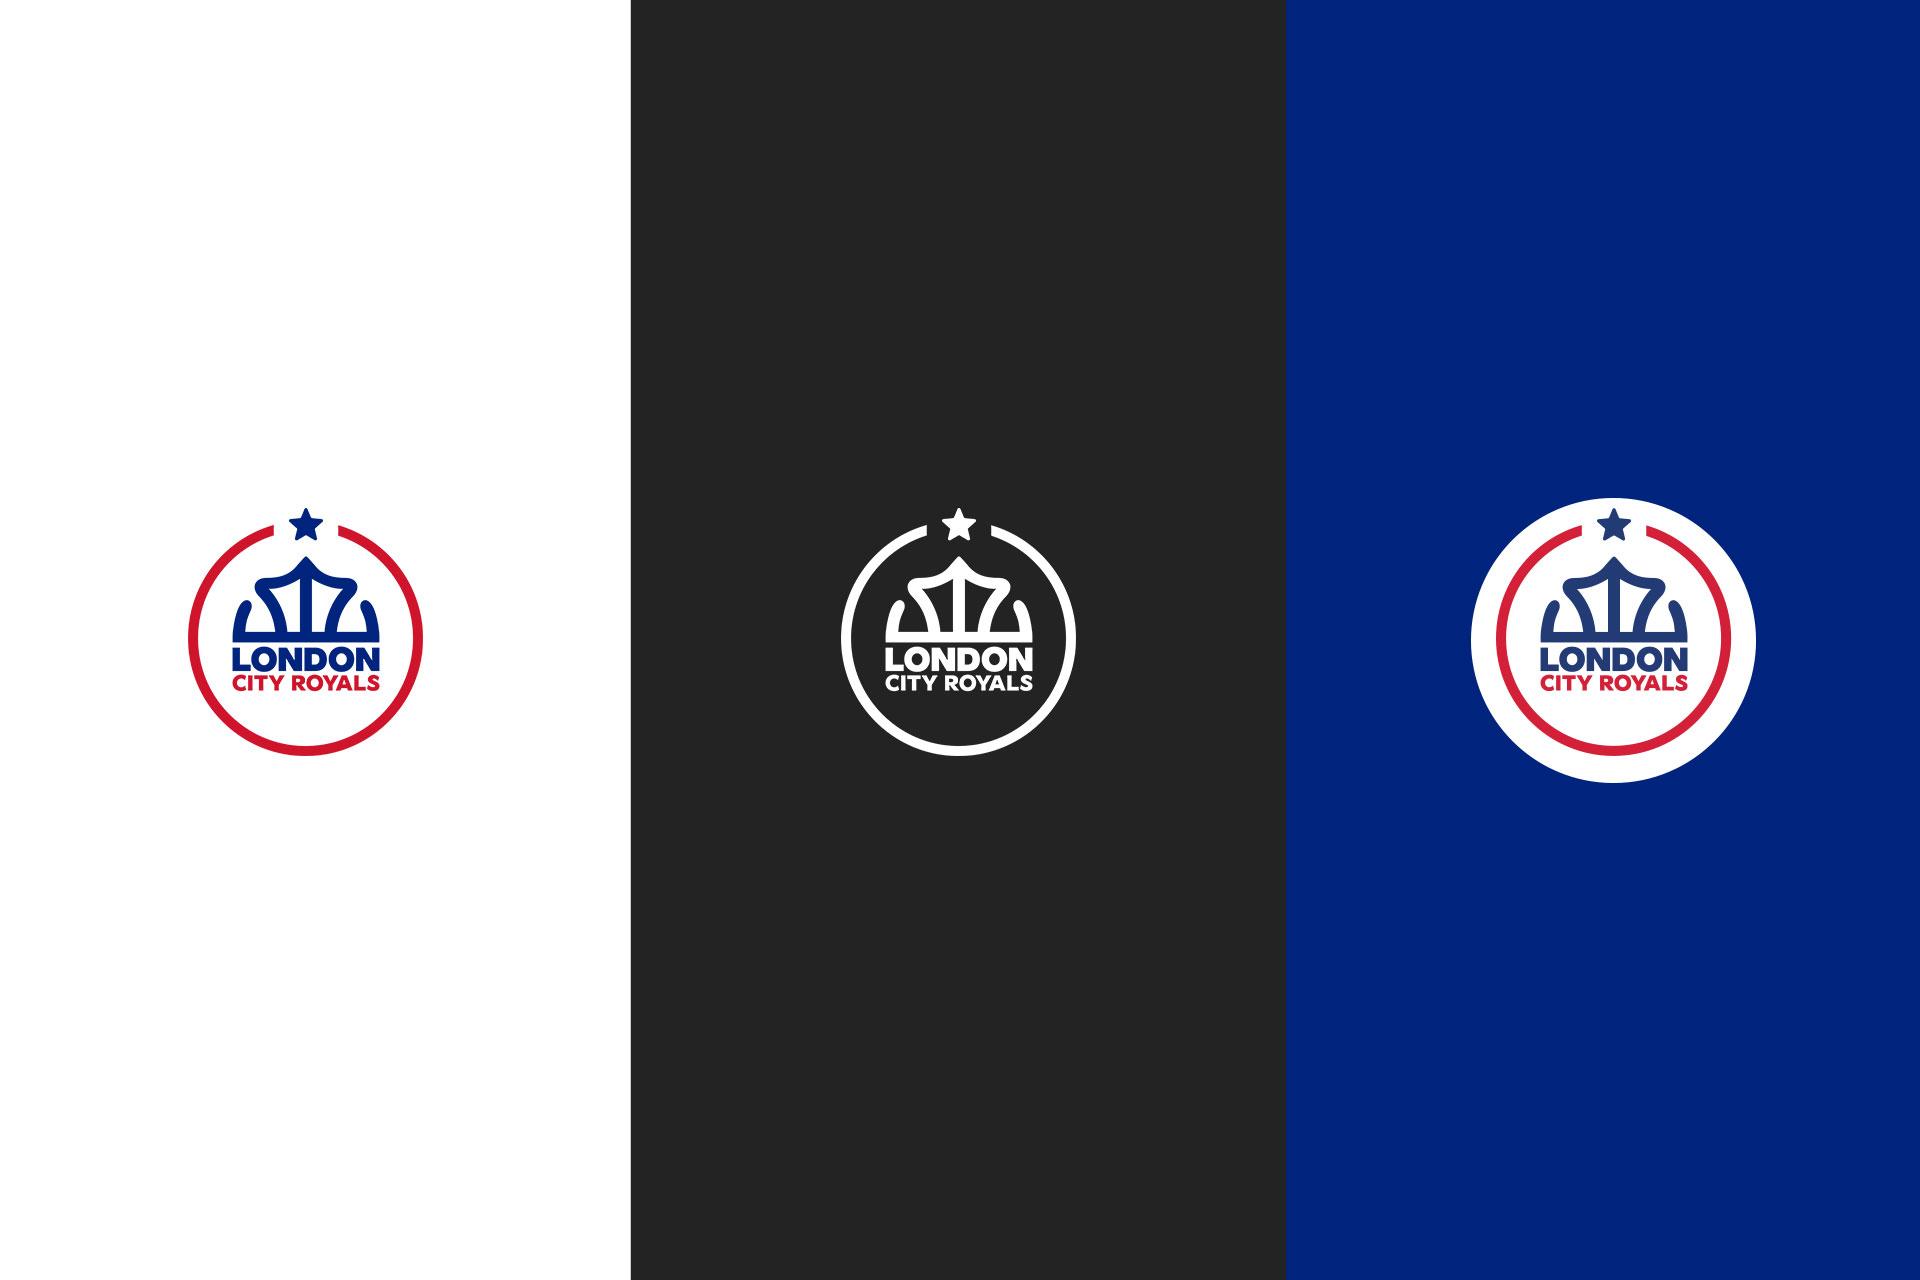 London-City-Royals-basketball-logo-branding-by-Orfi-Media